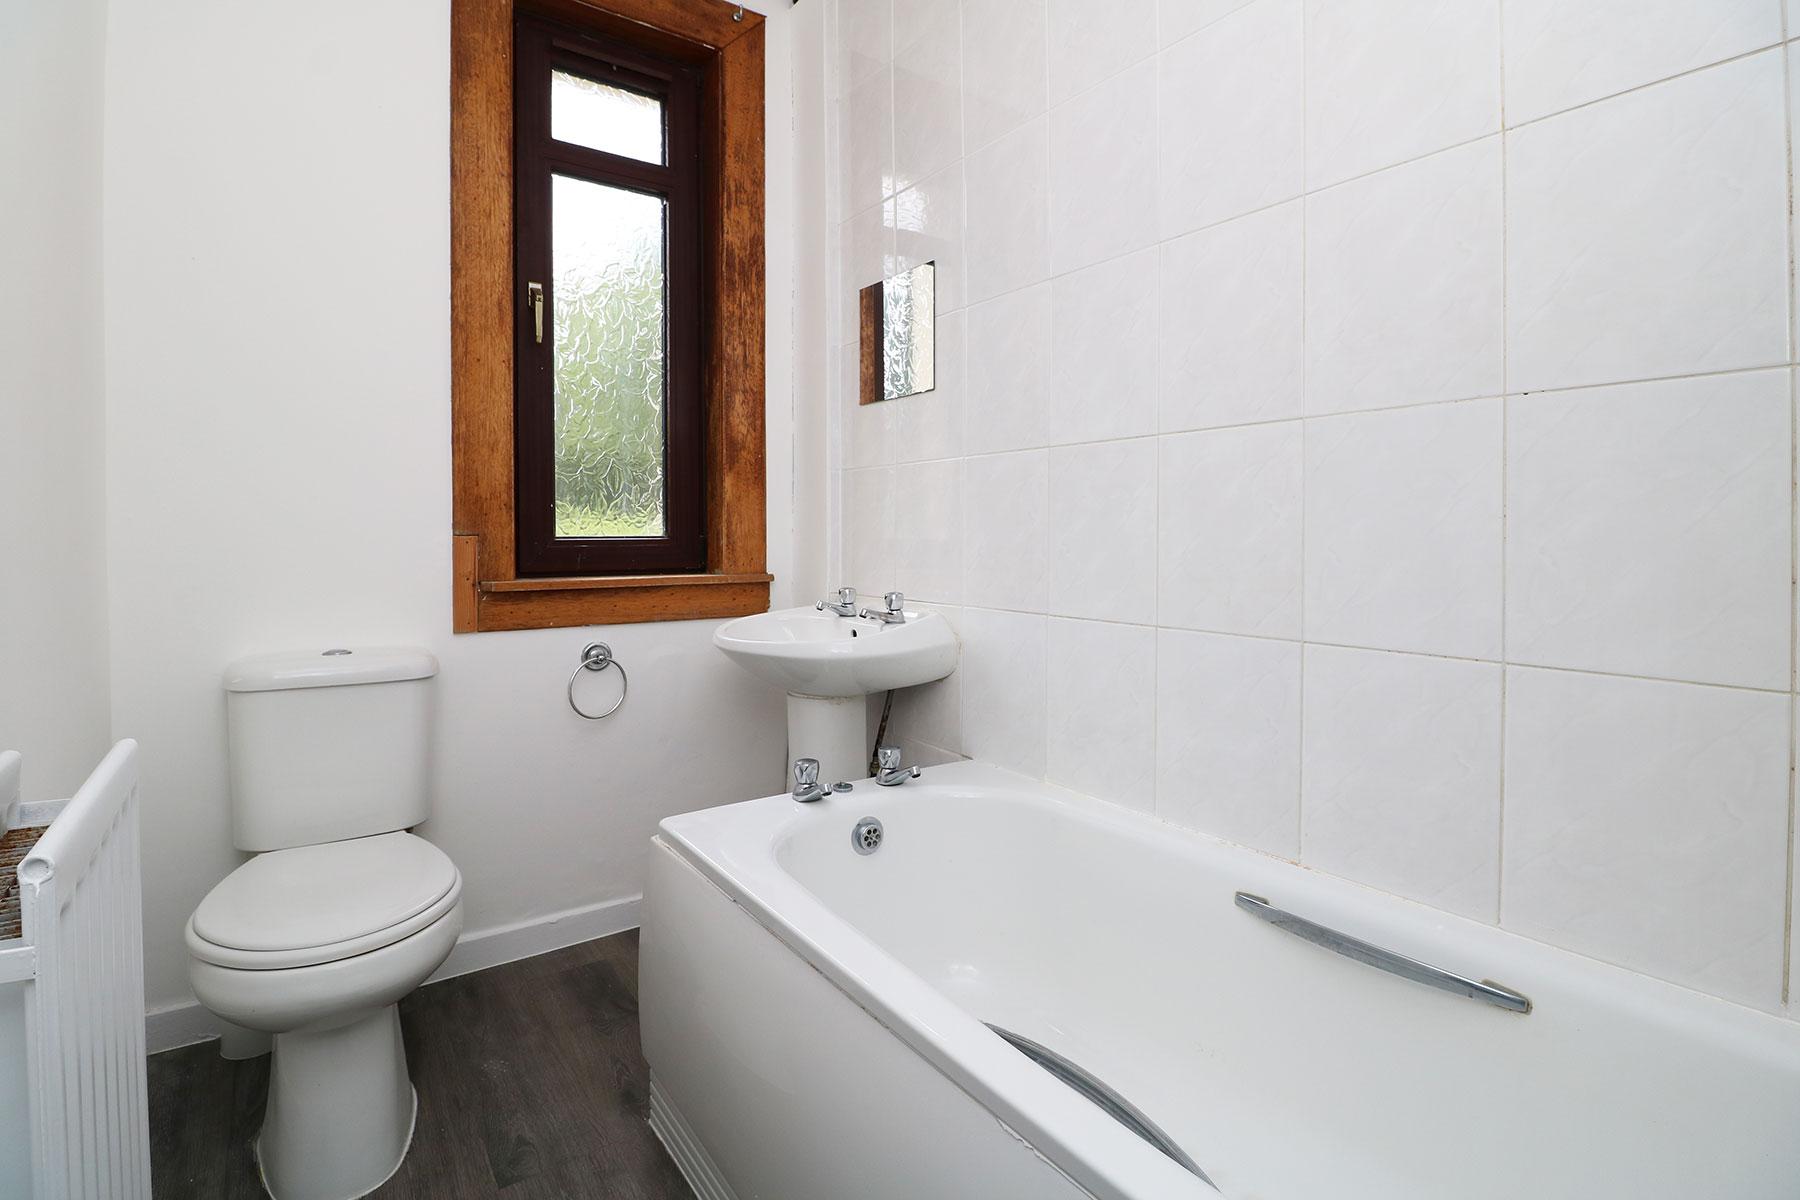 kerrsview-terrace-bathroom.jpg